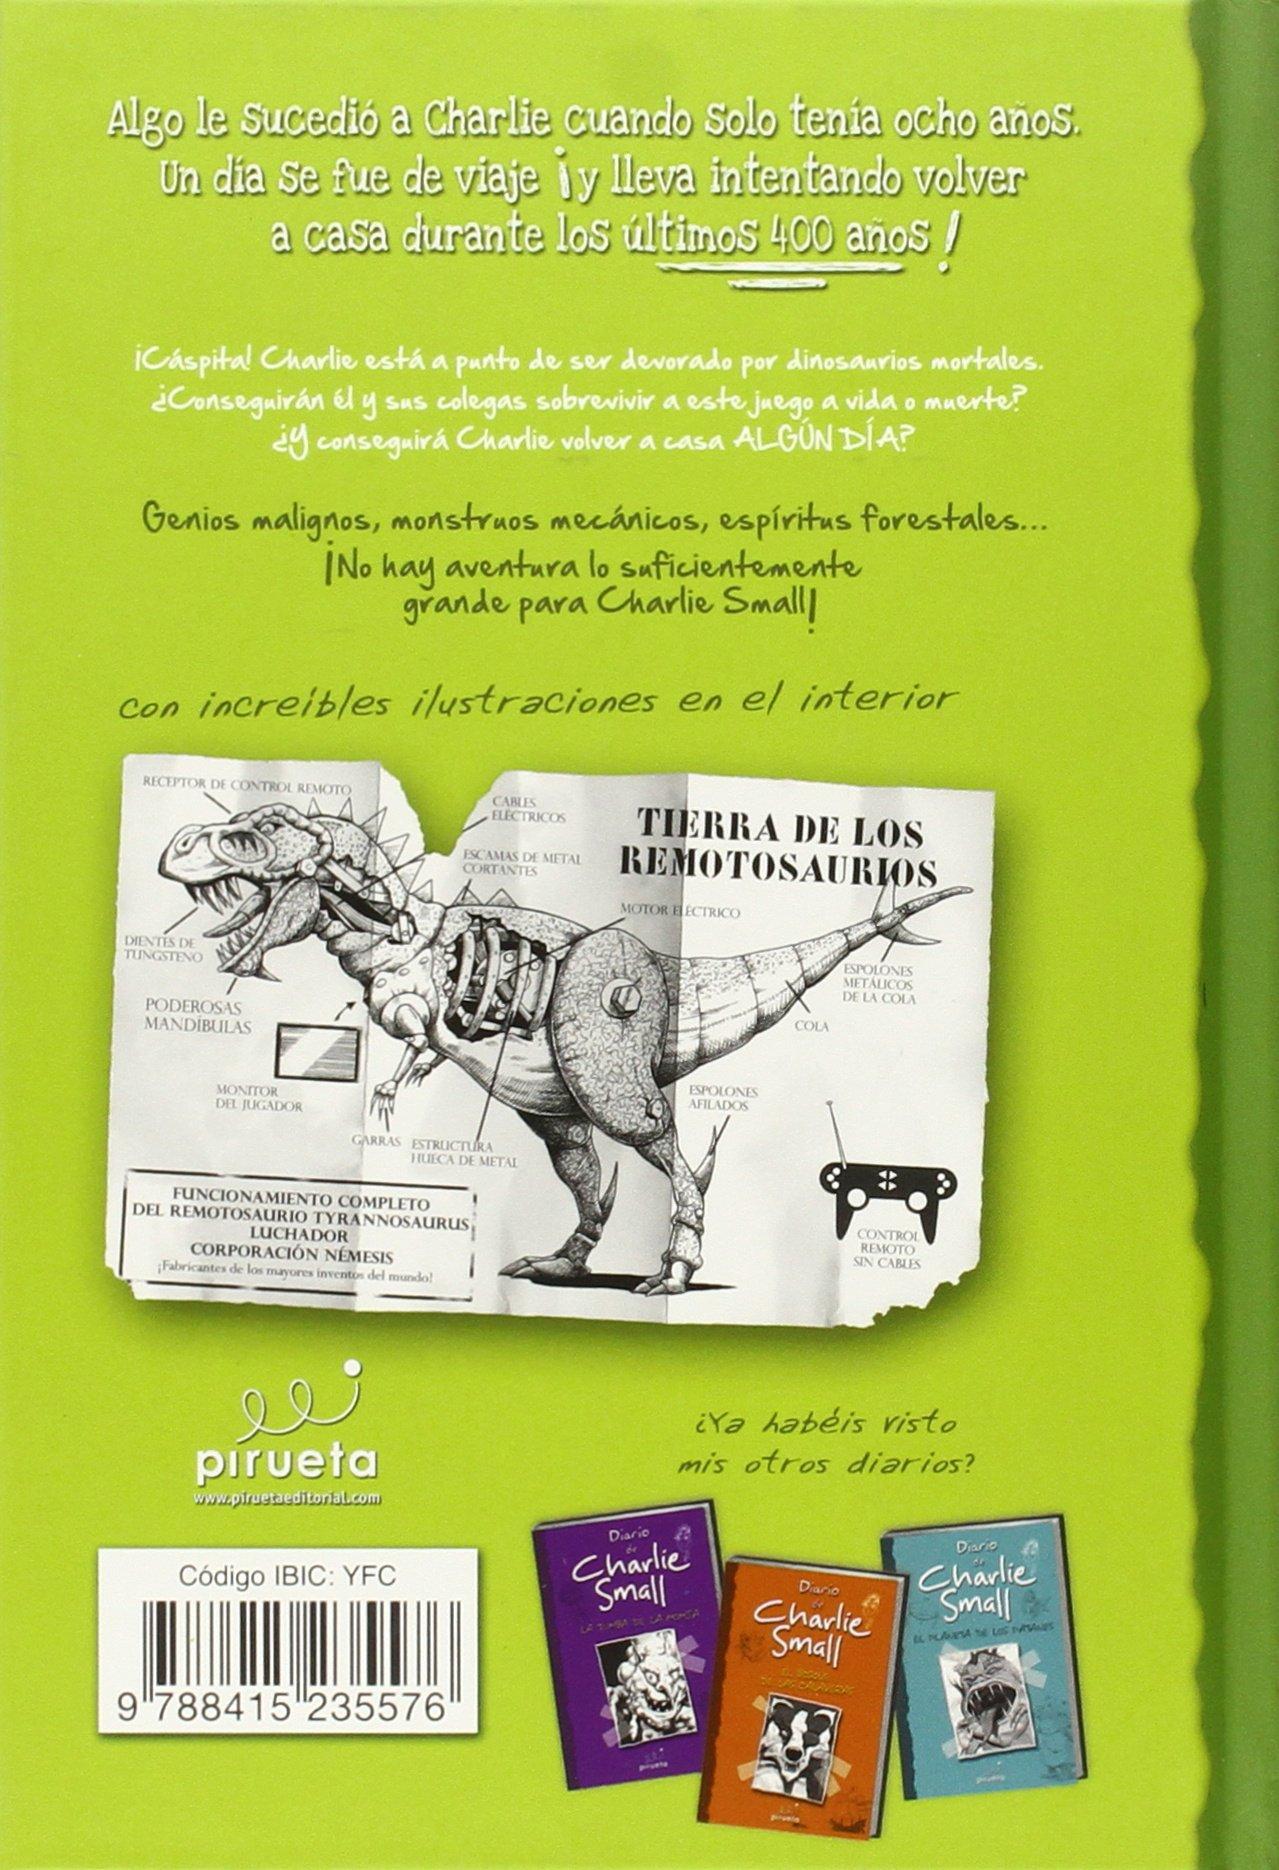 Charlie Small. En el pais de los Remotosauros (Spanish Edition): Charlie Small: 9788415235576: Amazon.com: Books